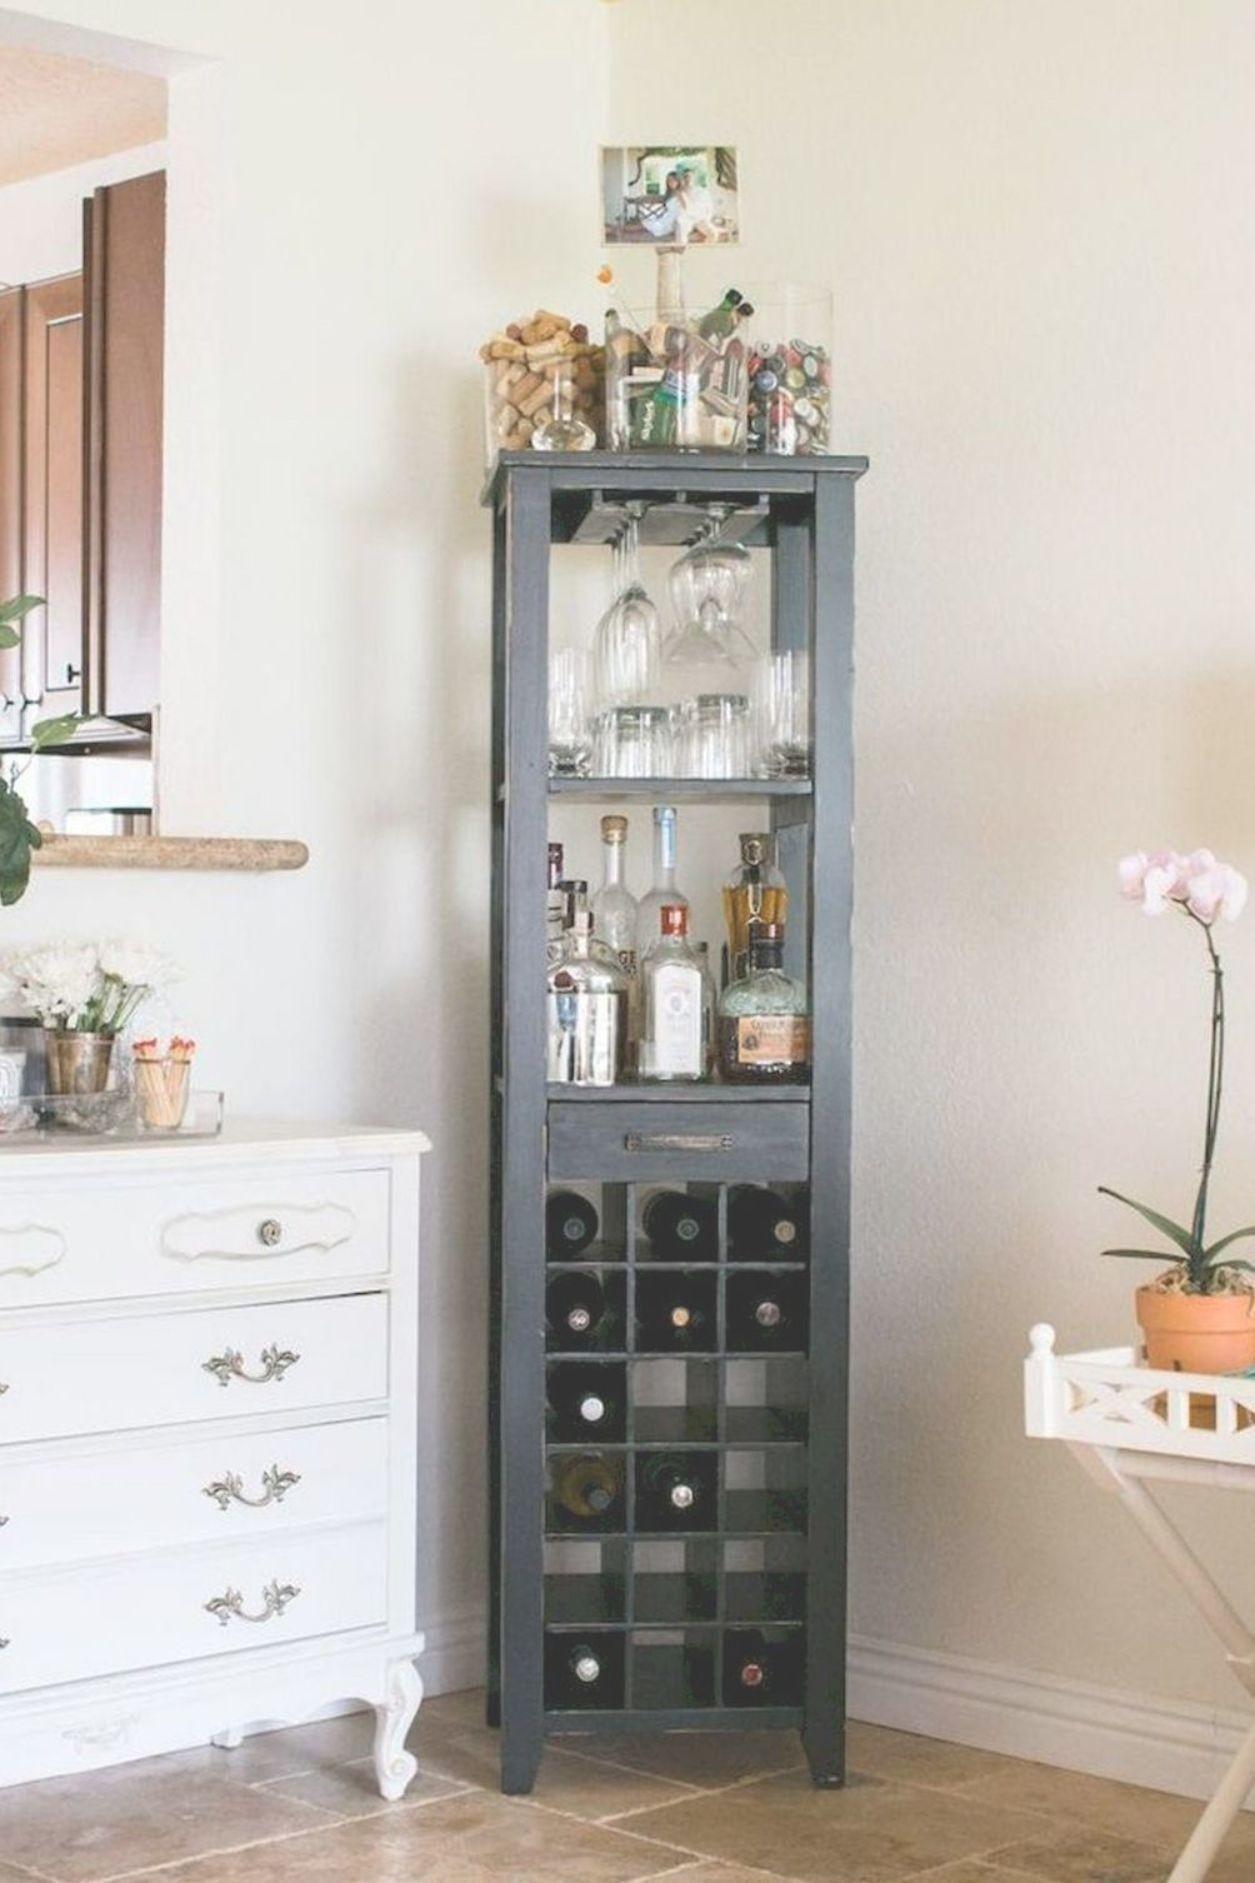 Elegant Mini Bar Ideas For Small Spaces Good Ideas